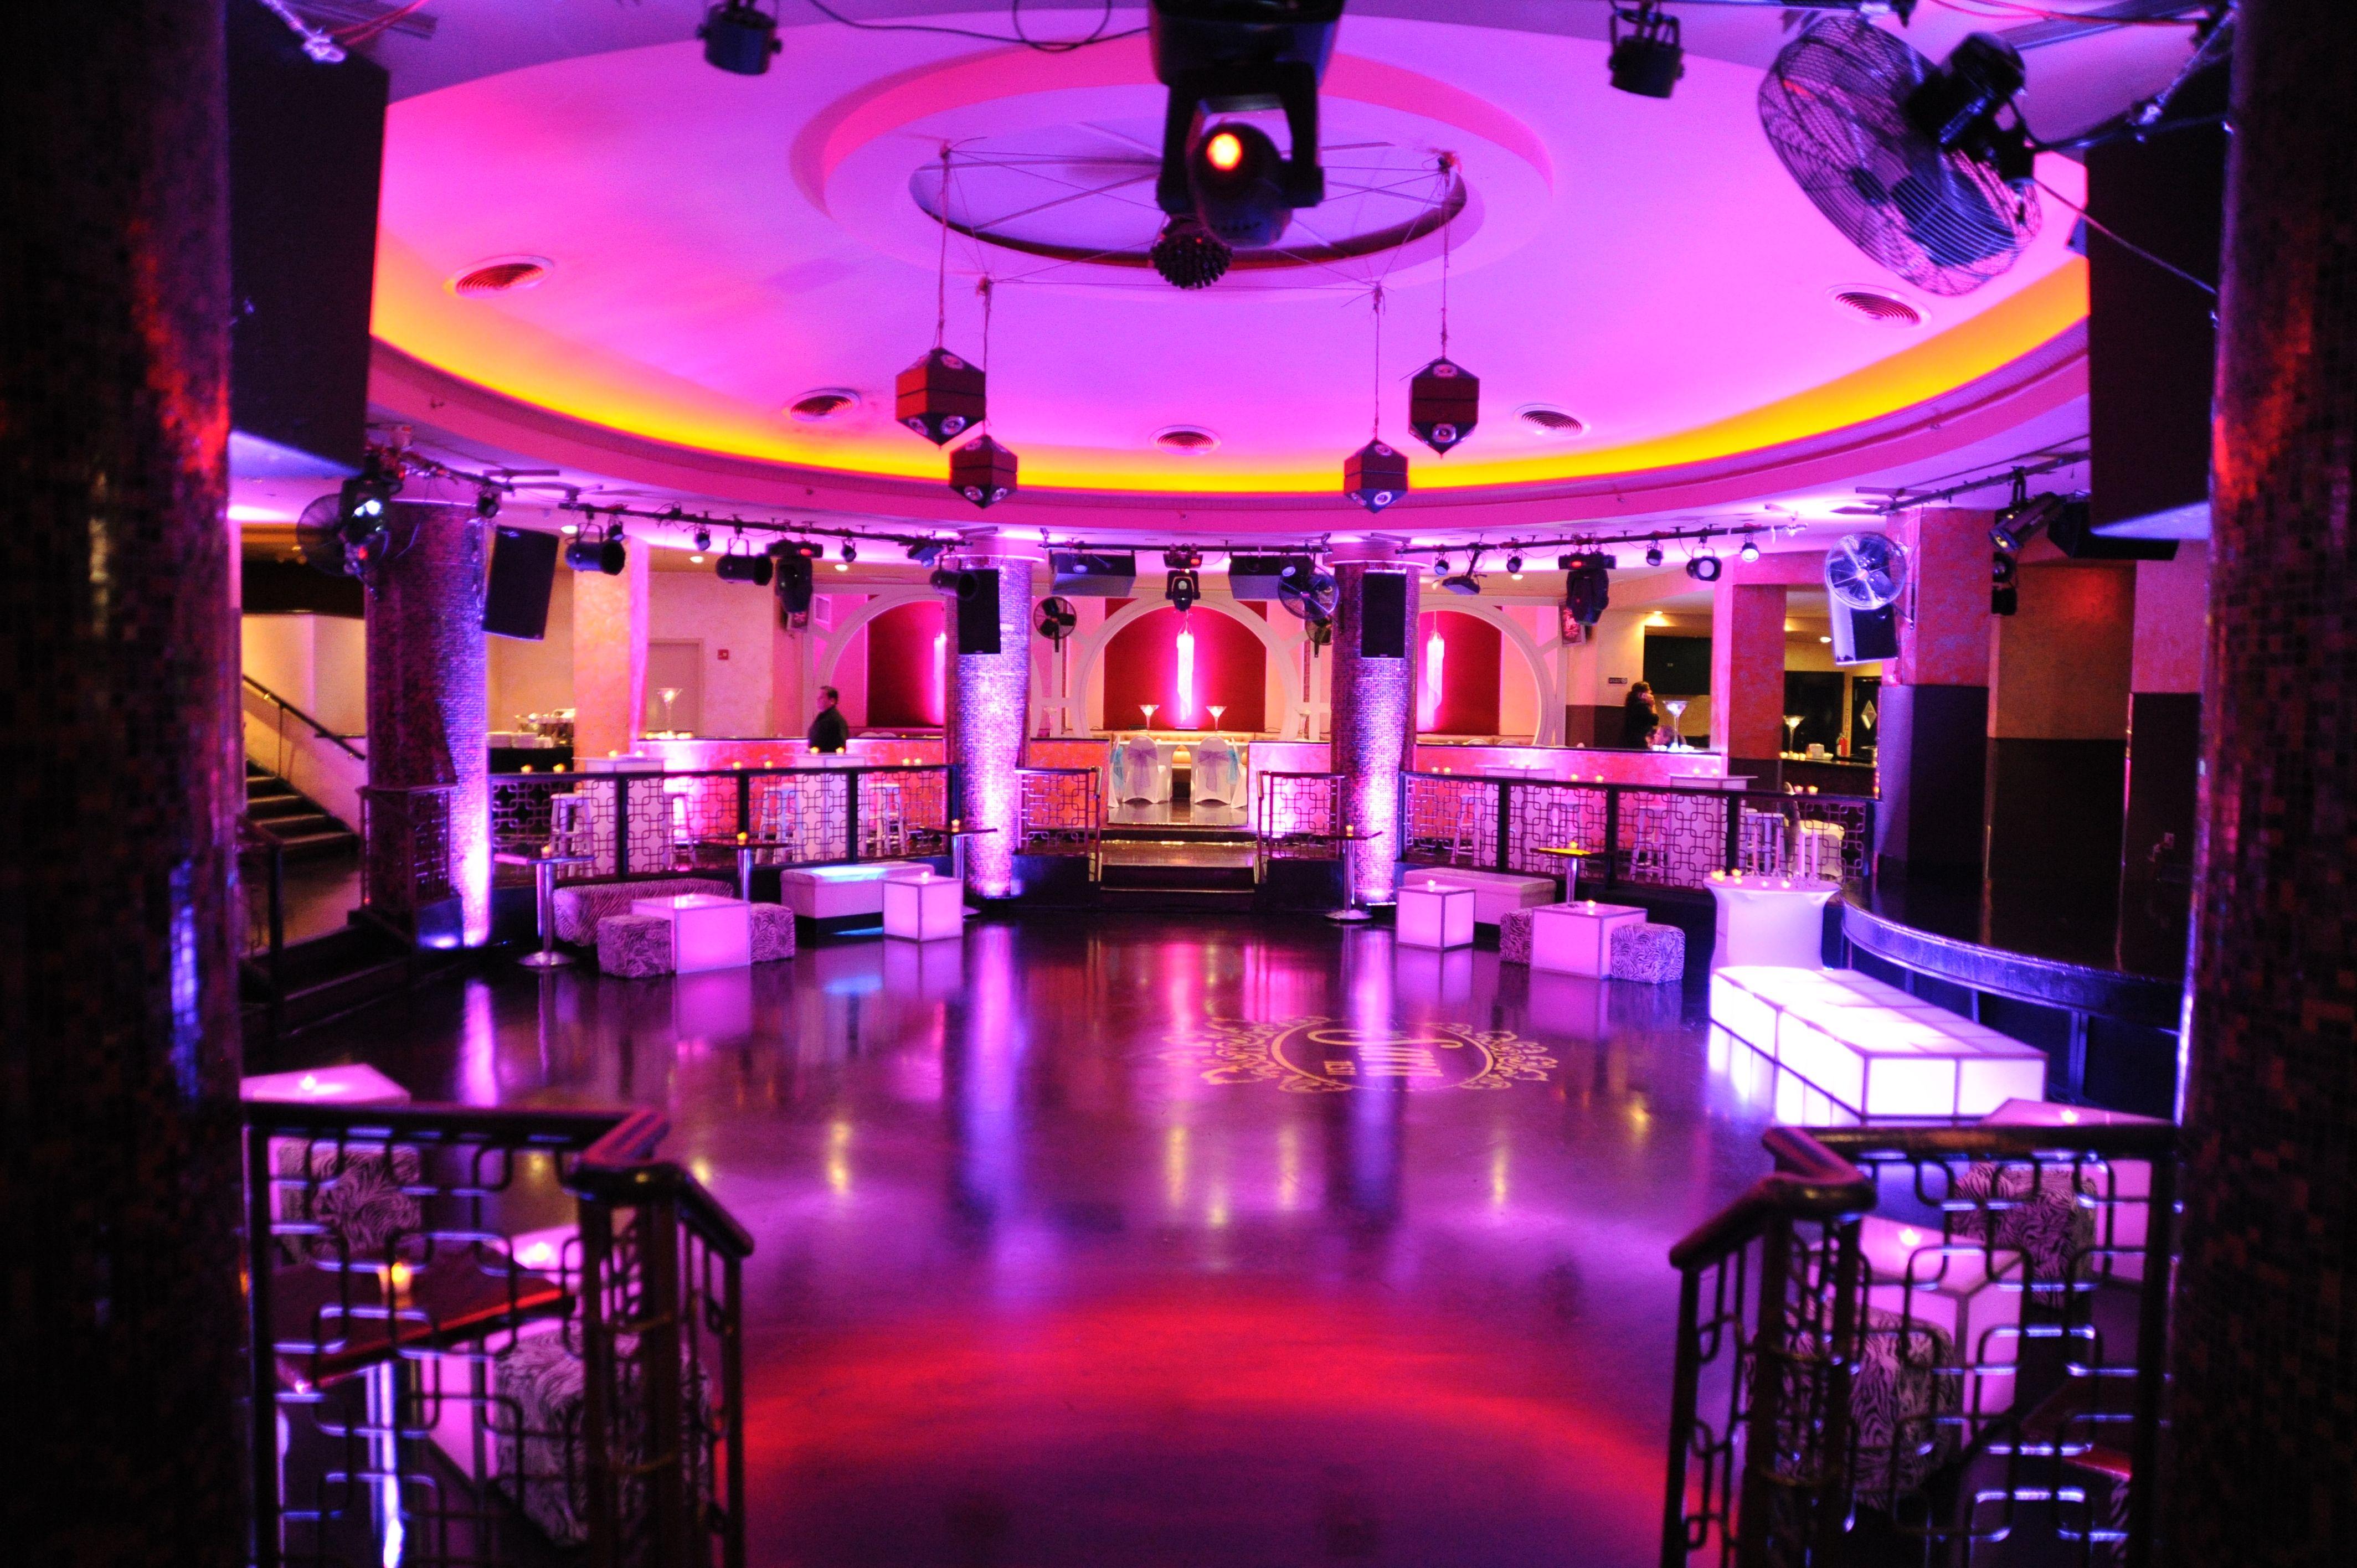 new york nightclubs - Google Search | Latin grammys, Night